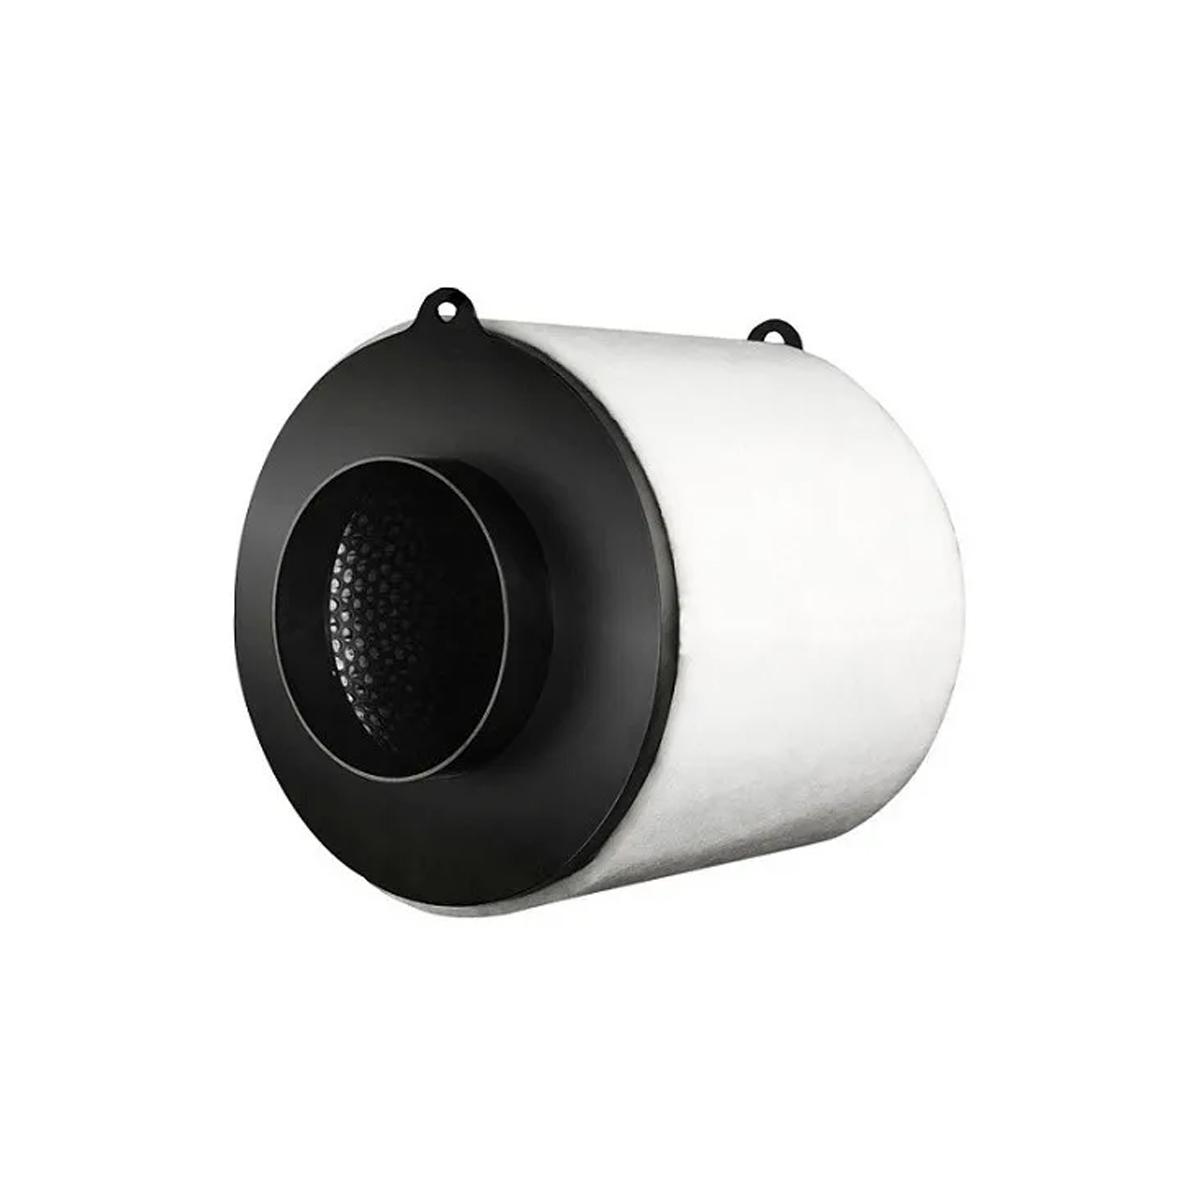 Filtro De Carbono Proactiv 100mm 250m3/h